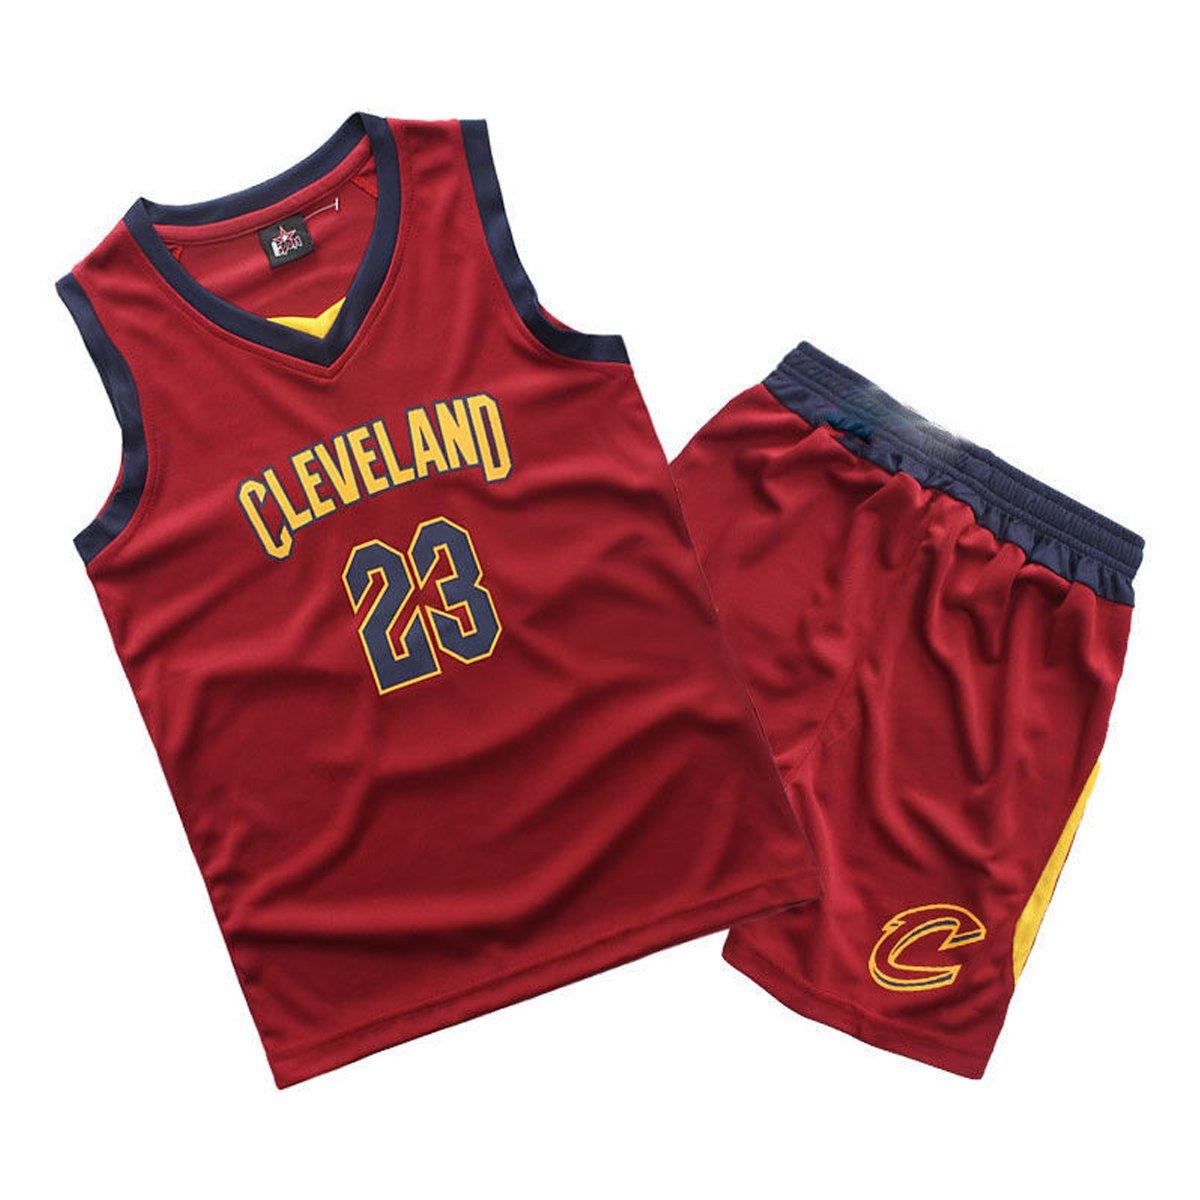 Kinder Jungen Cleveland Cavaliers Lebron James # 23 Basketball Shorts Sommer Jerseys Basketball Uniform Top und Shorts Basketball Anzug